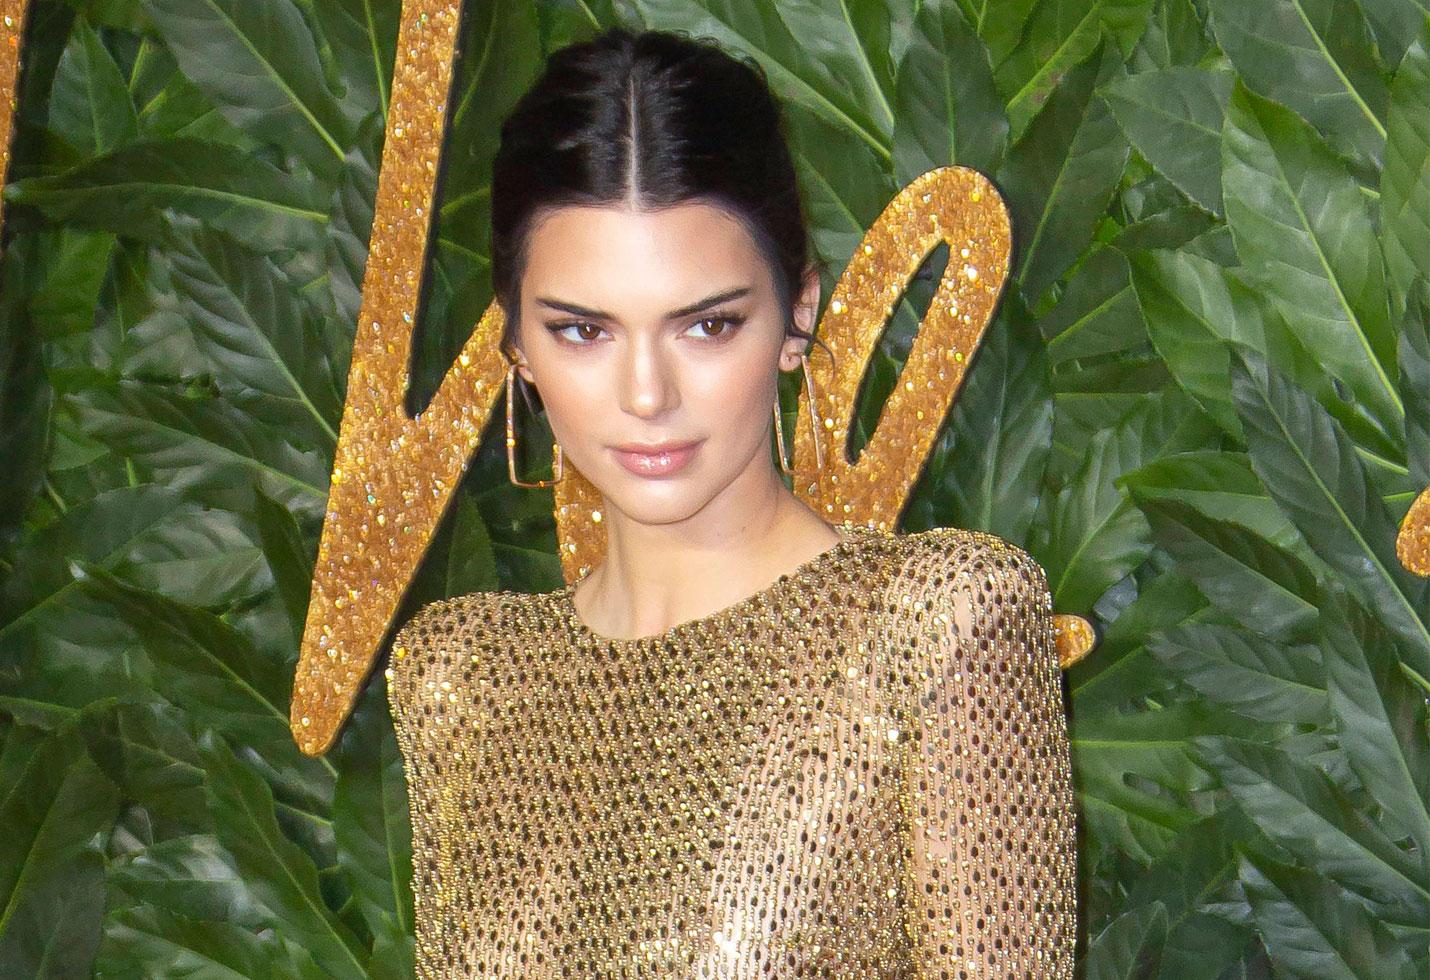 Kendall jenner dating demands